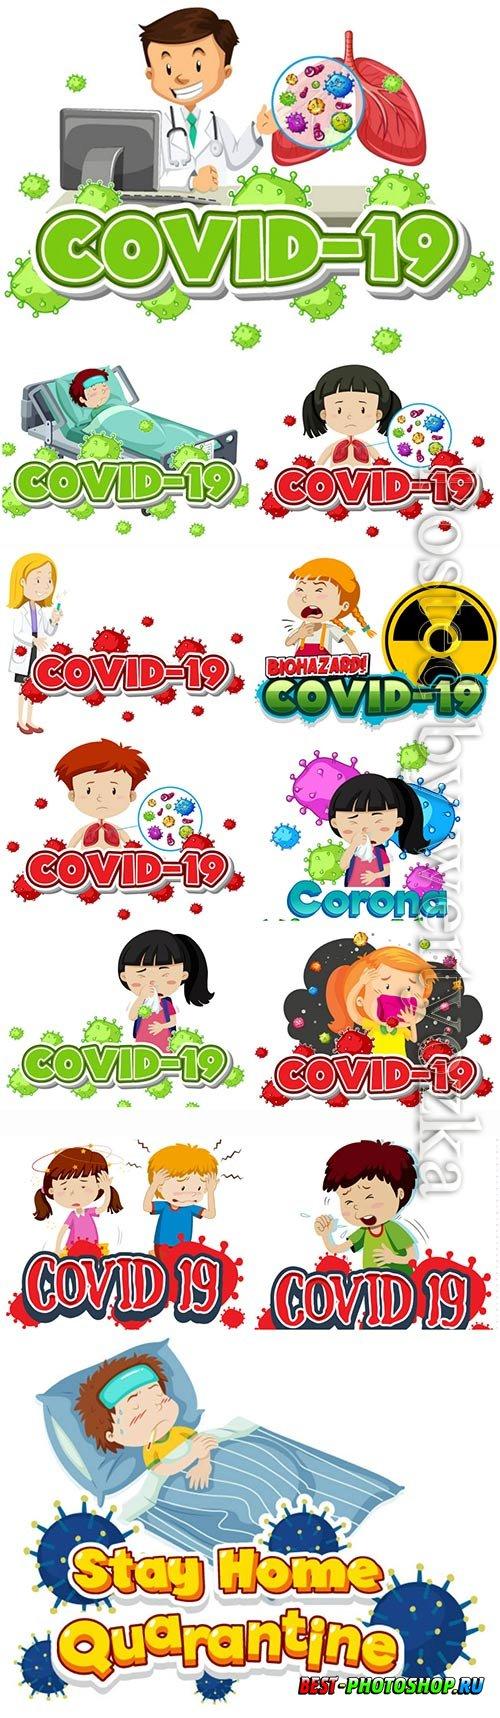 COVID 19, Coranavirus vector illustration sets # 18